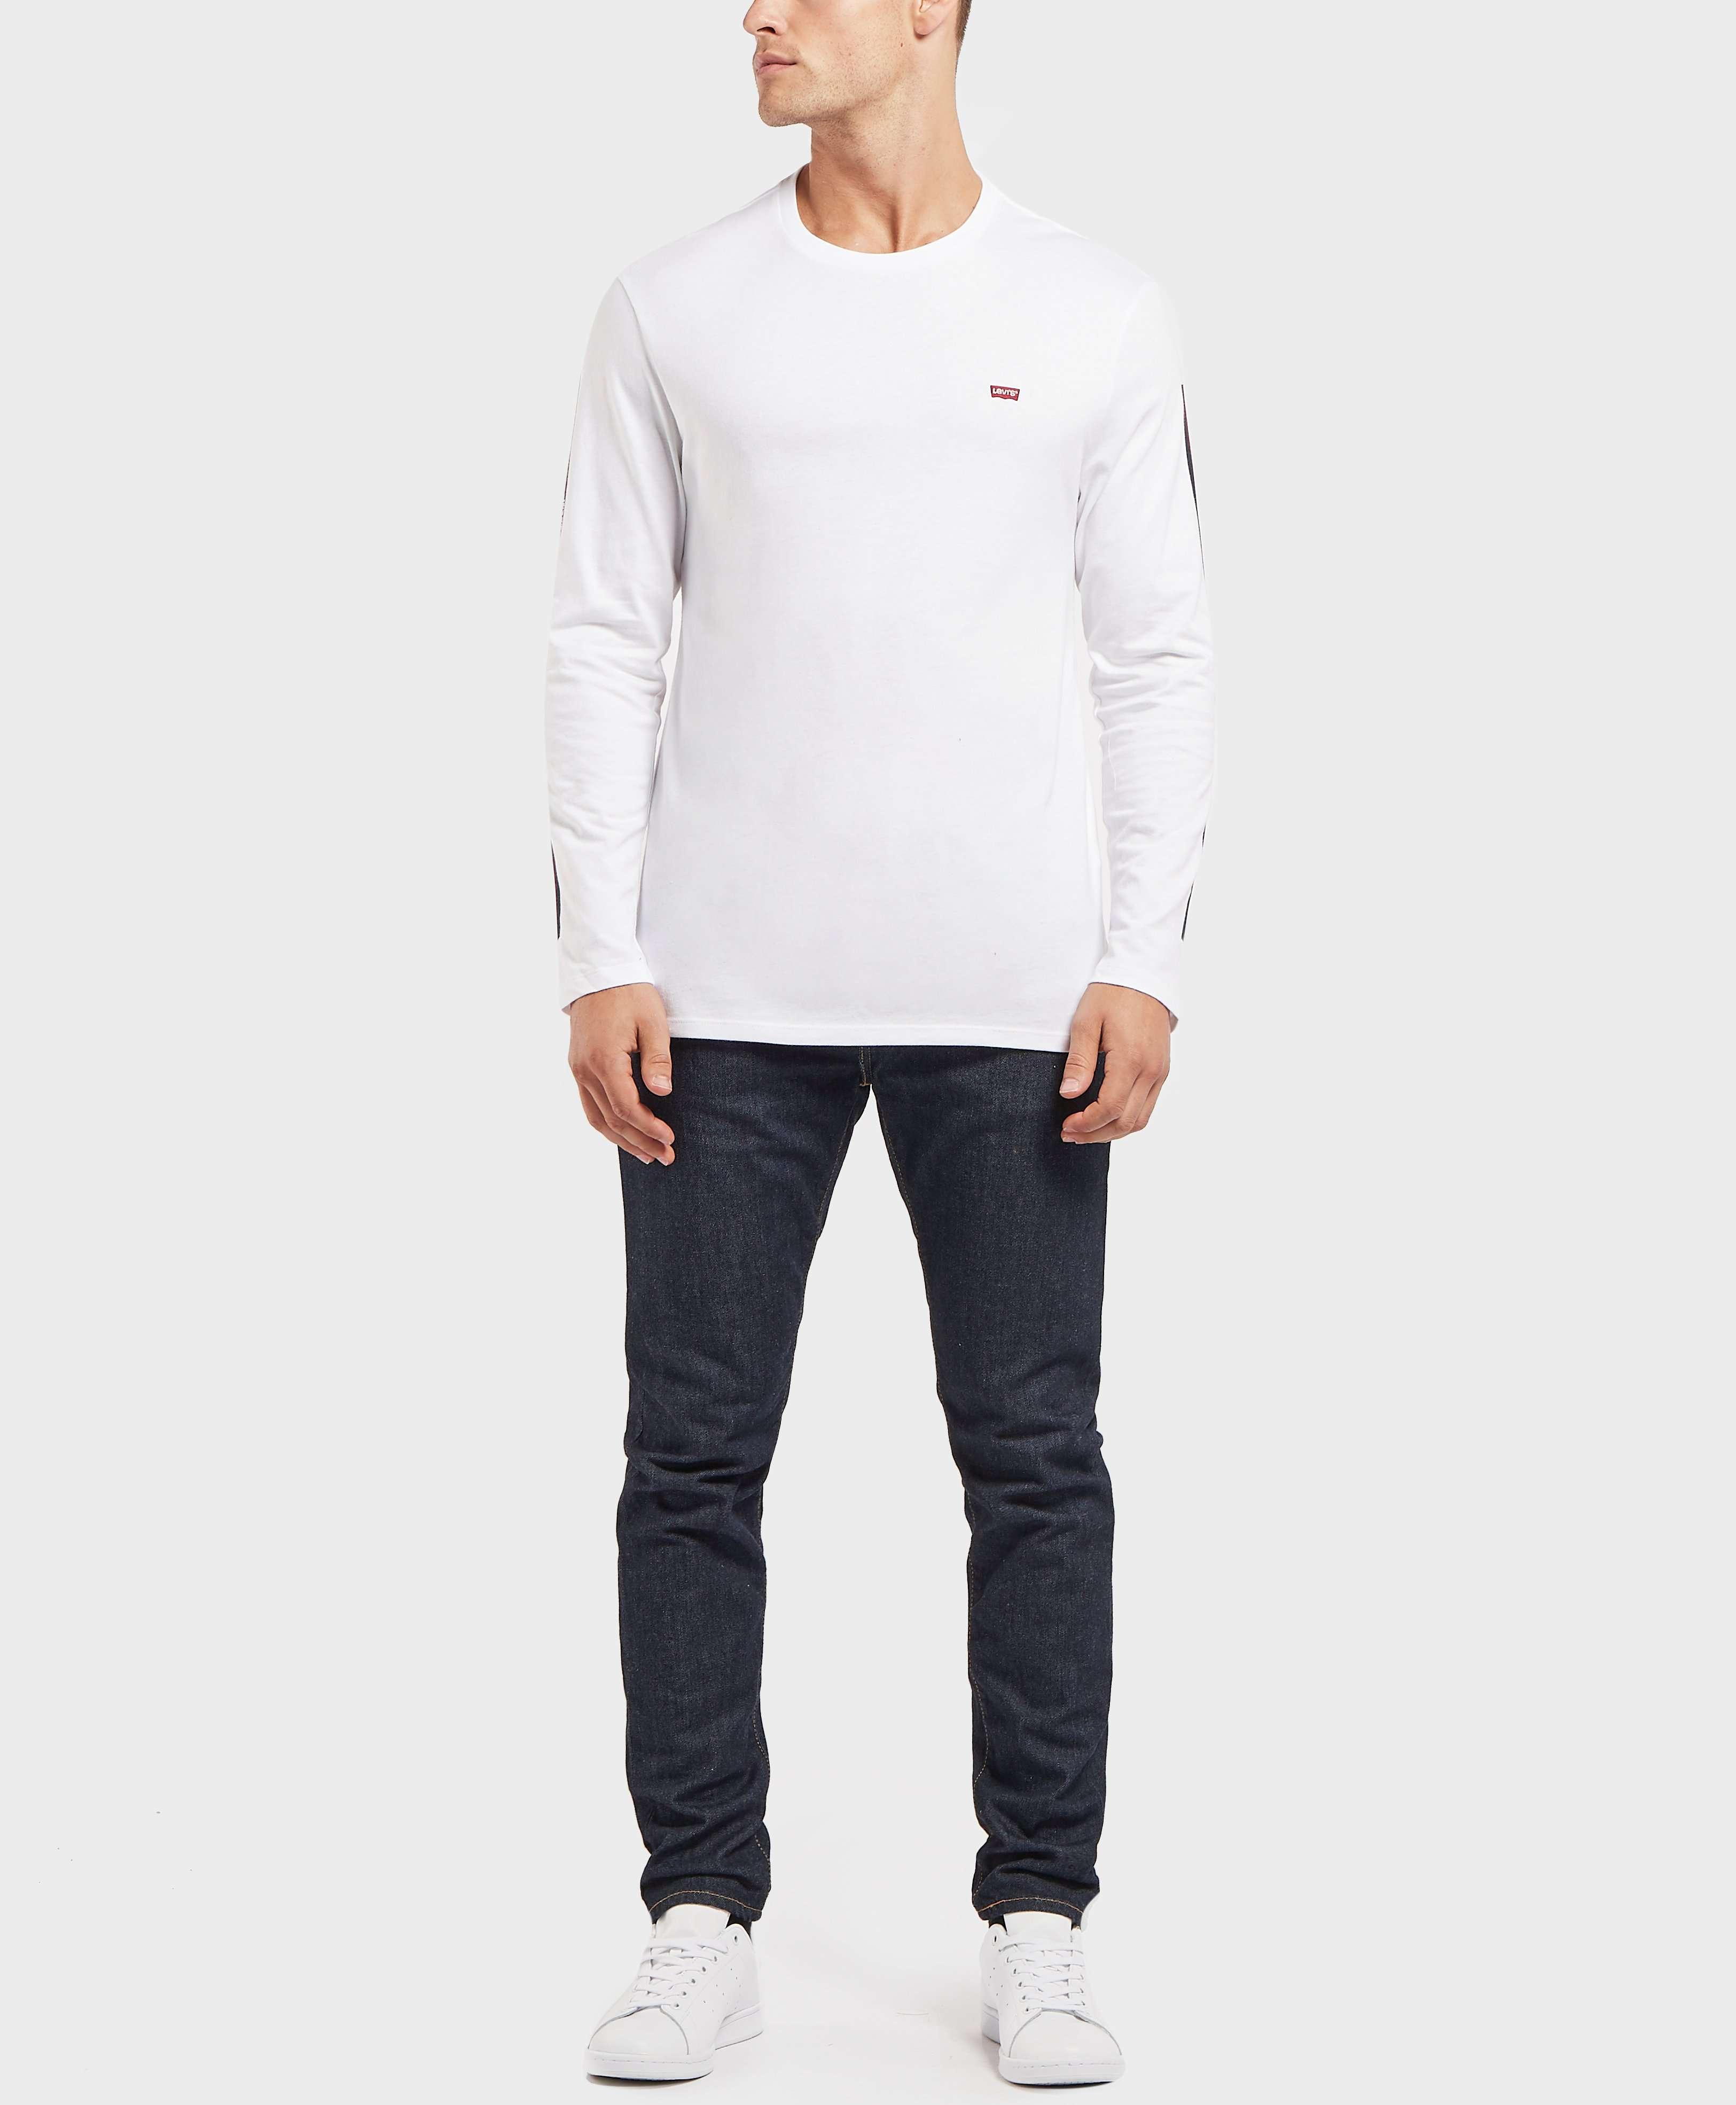 Levis Reissue Long Sleeve T-Shirt